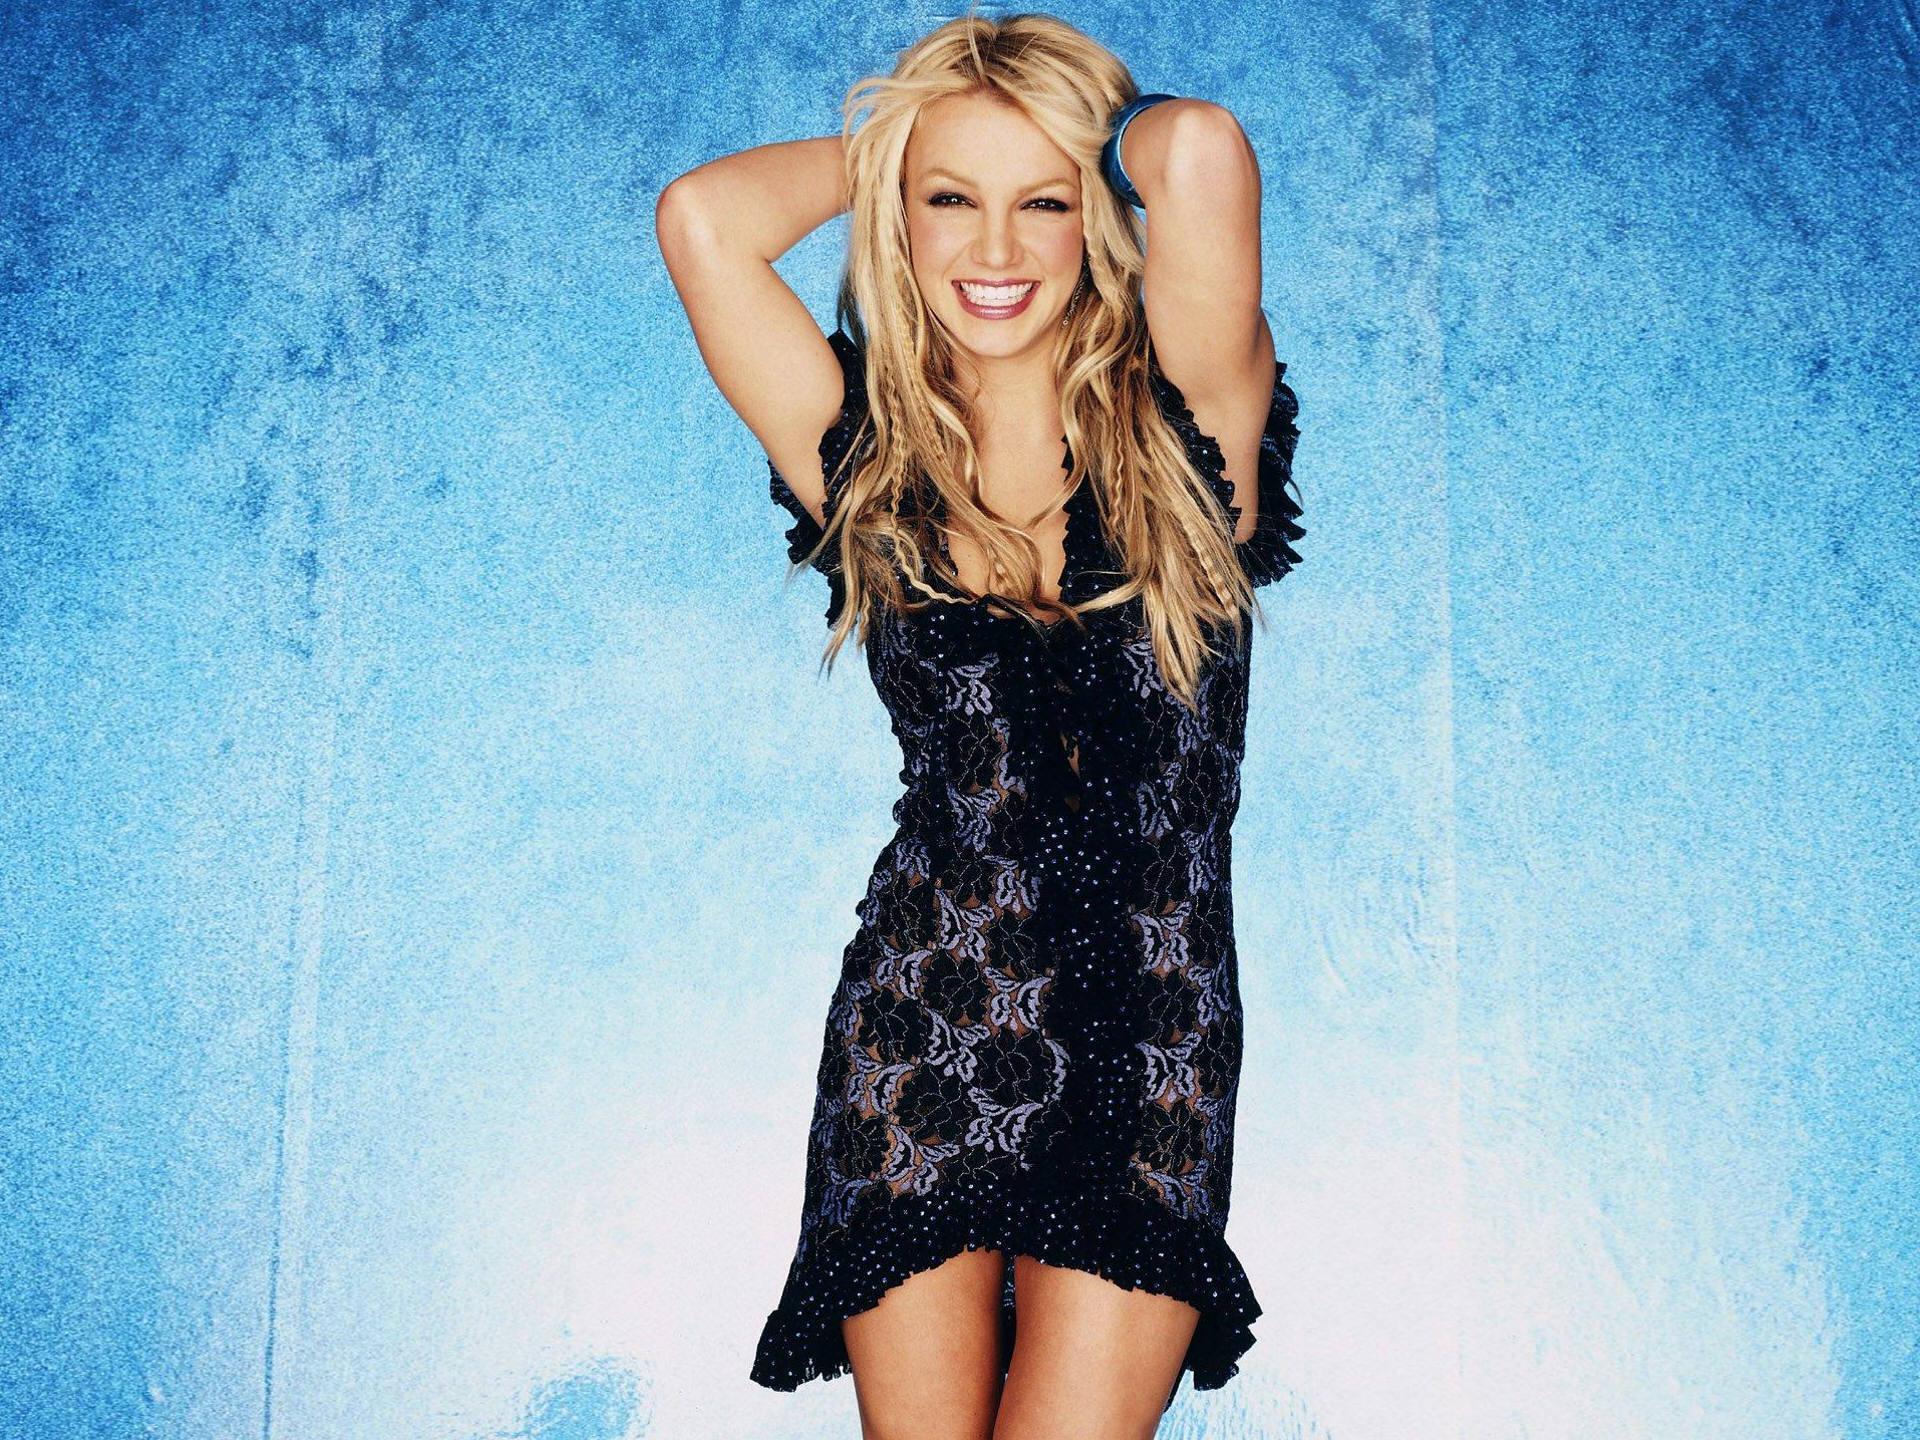 Britney Pretty Dress hình nền